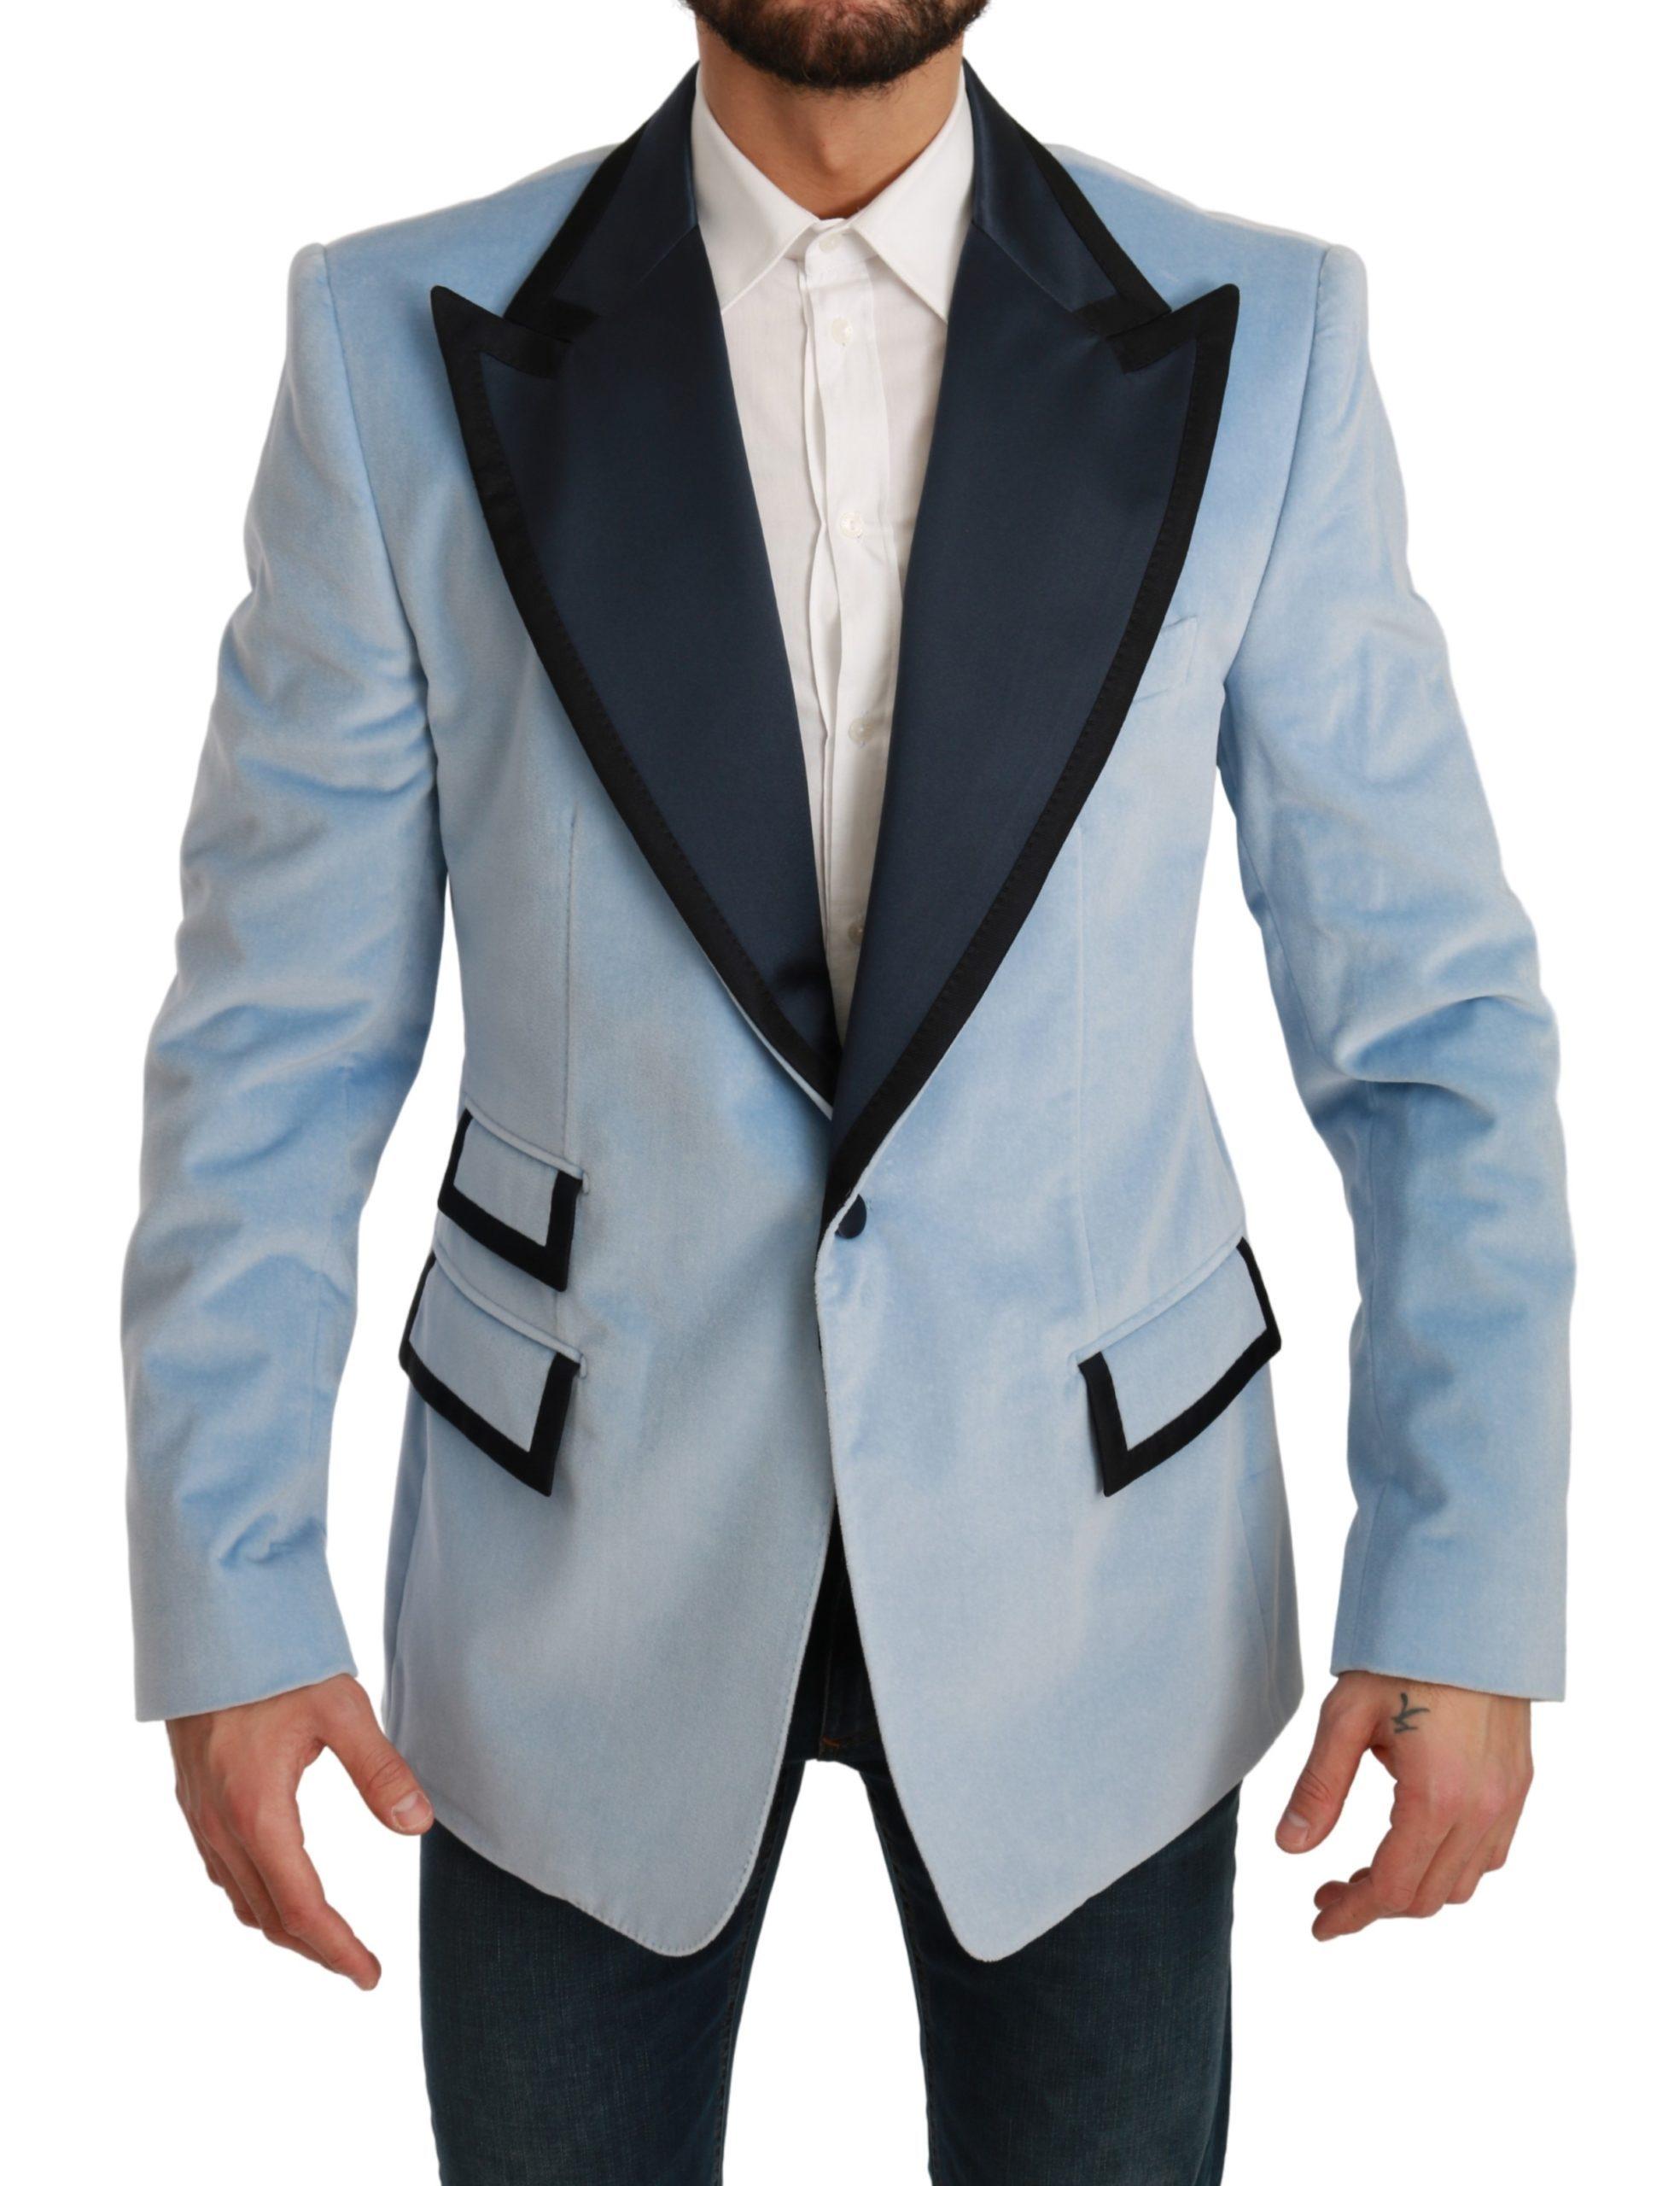 Dolce & Gabbana Men's Slim Fit Jacket Velvet Blazer Light Blue KOS1706 - IT54   XL